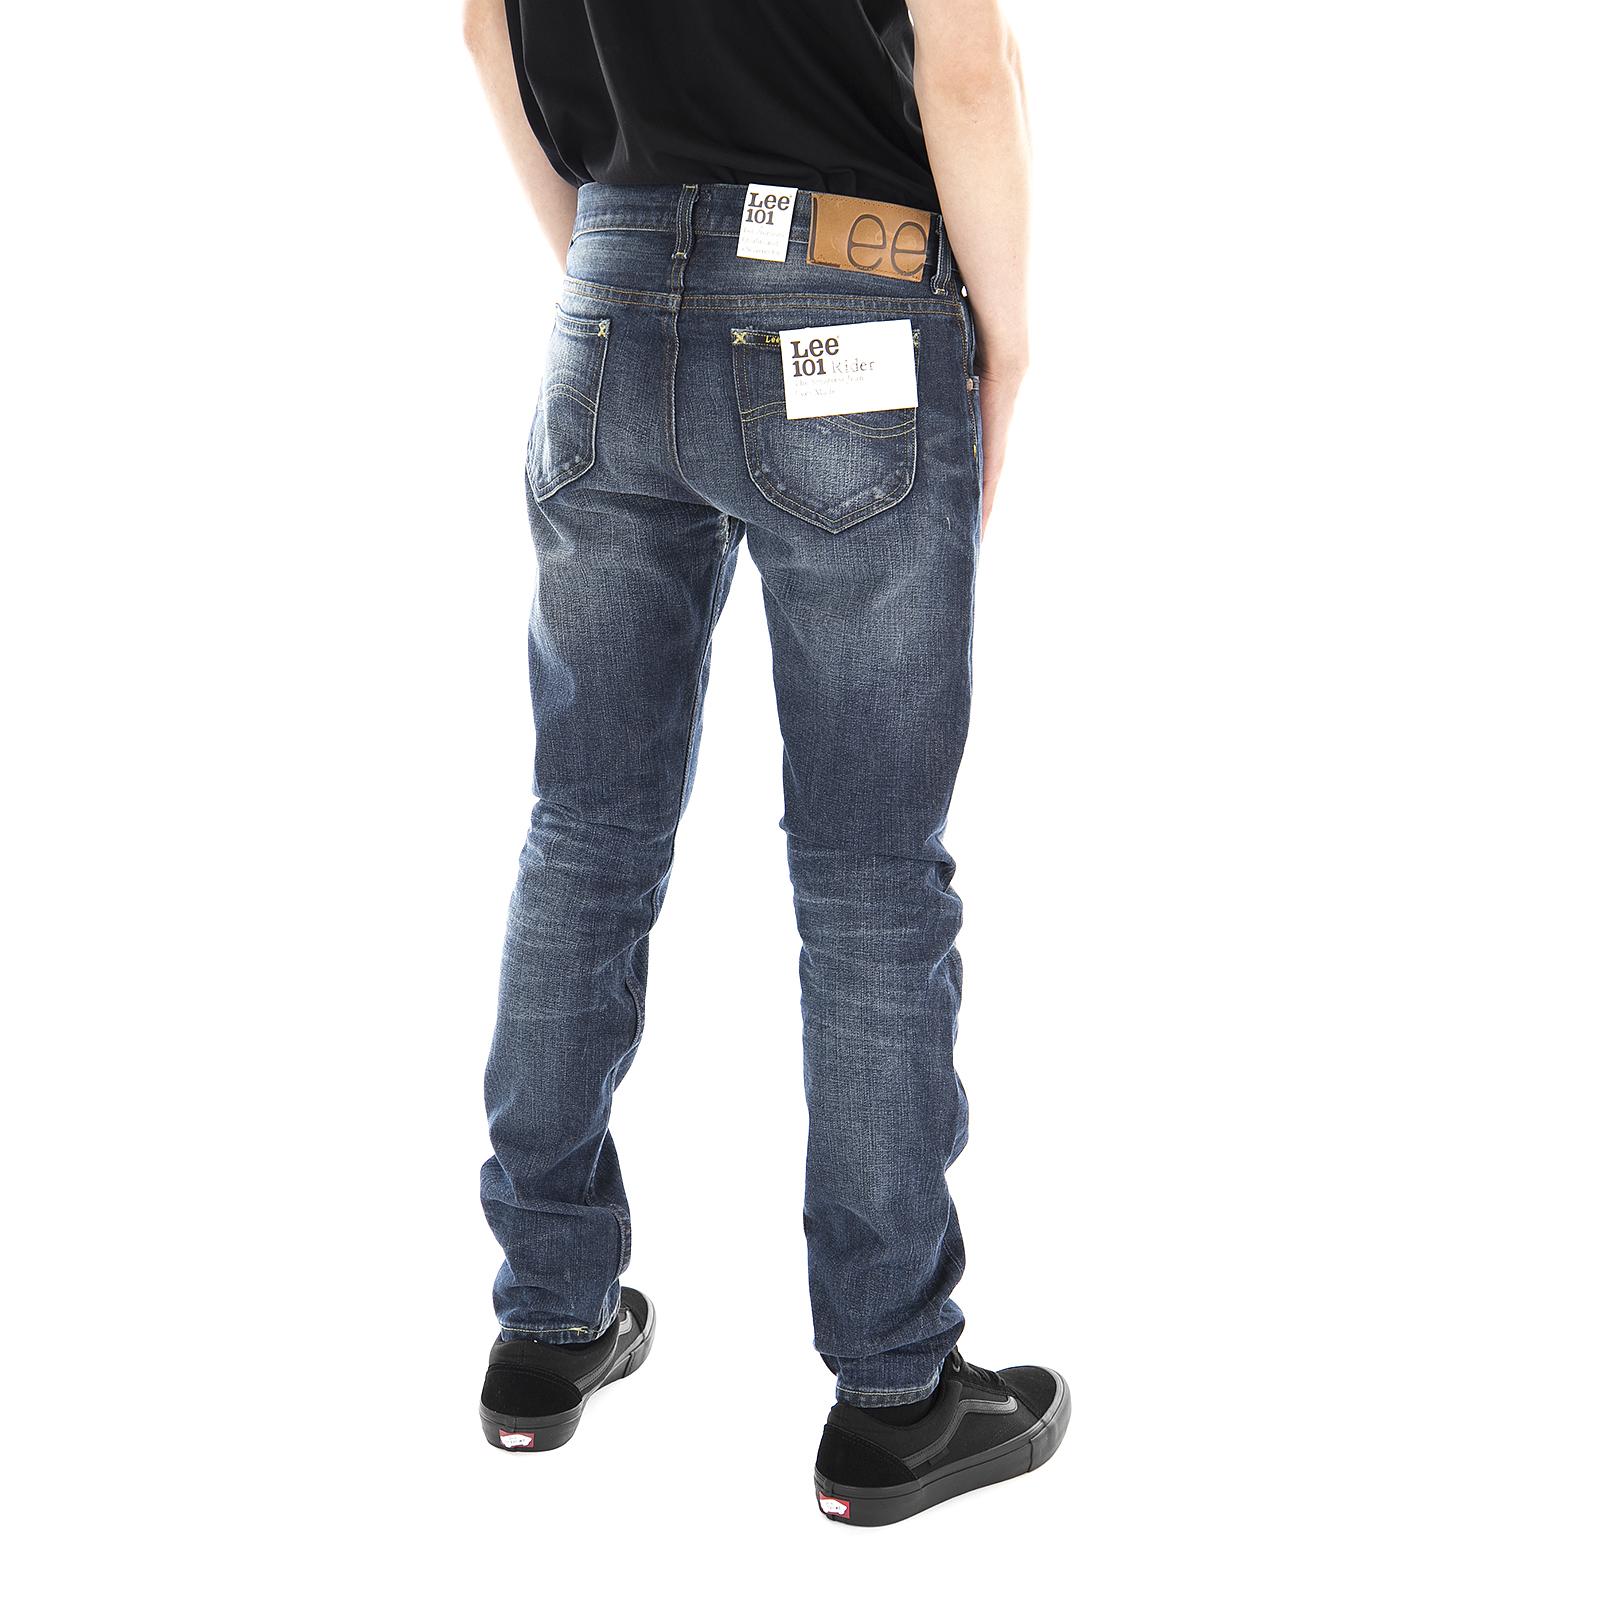 Nights Jeans Rider Brooklyn Denim 101 Lee wxZqavTYv